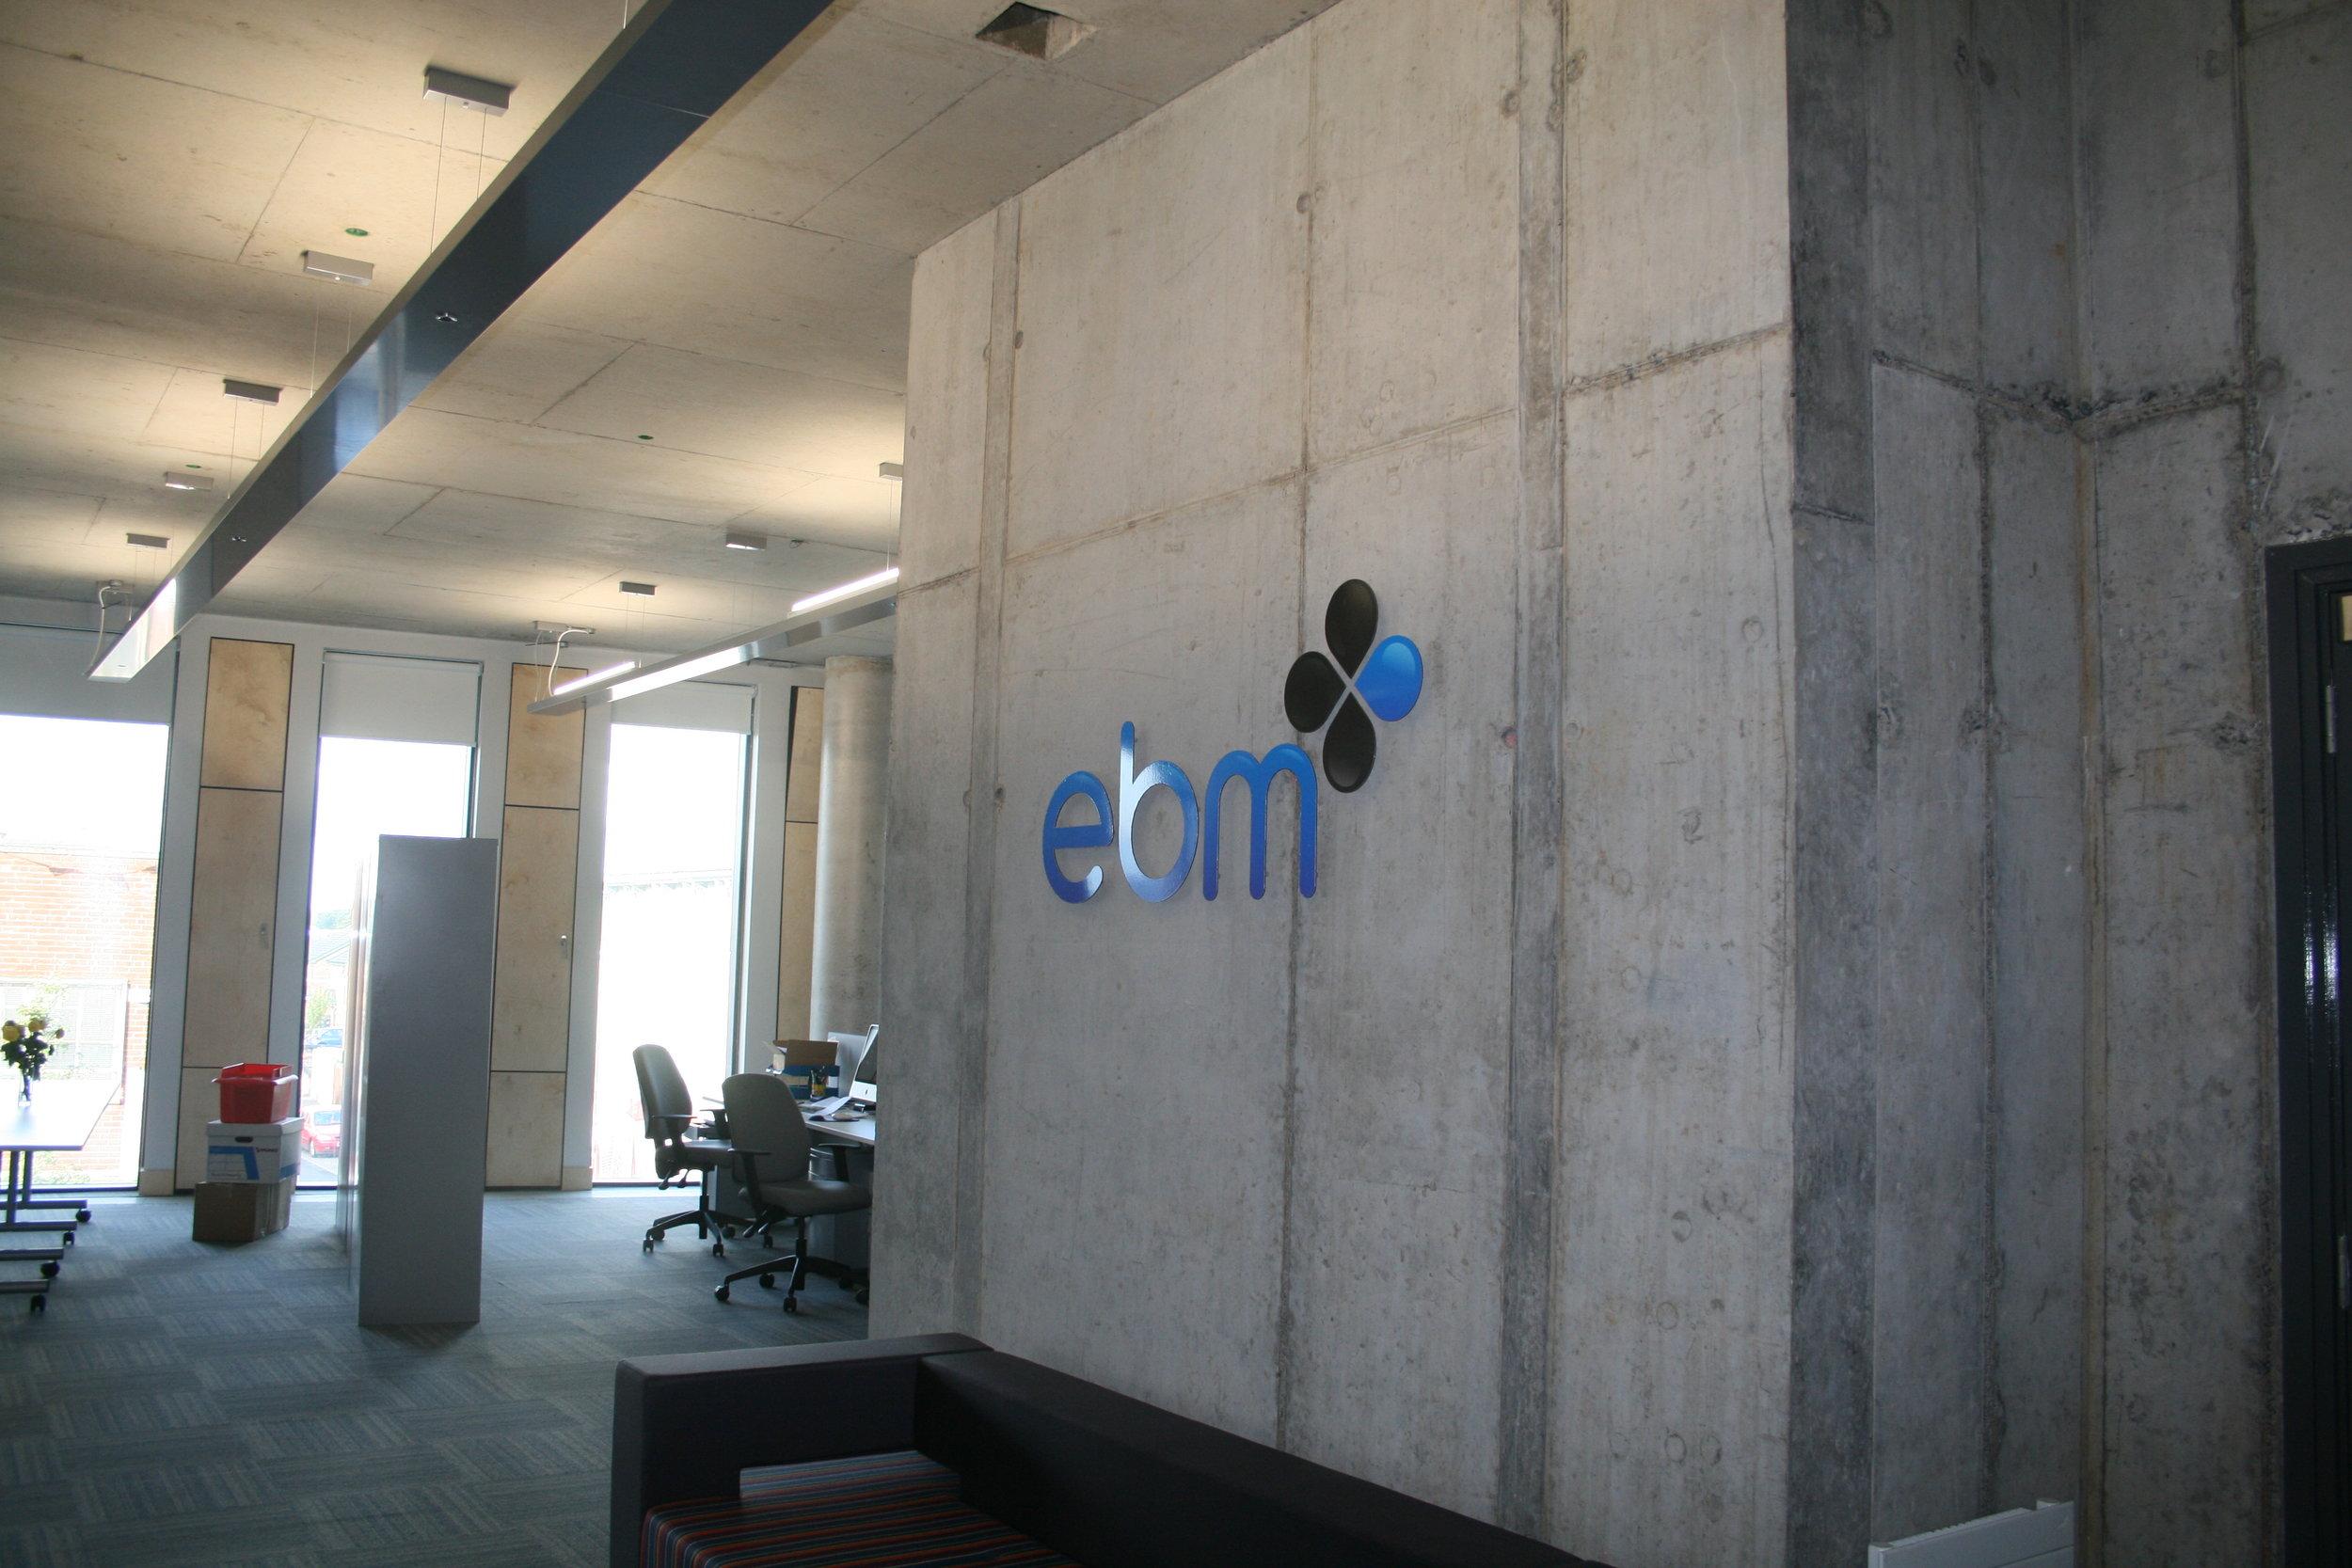 ebm offices 1.JPG